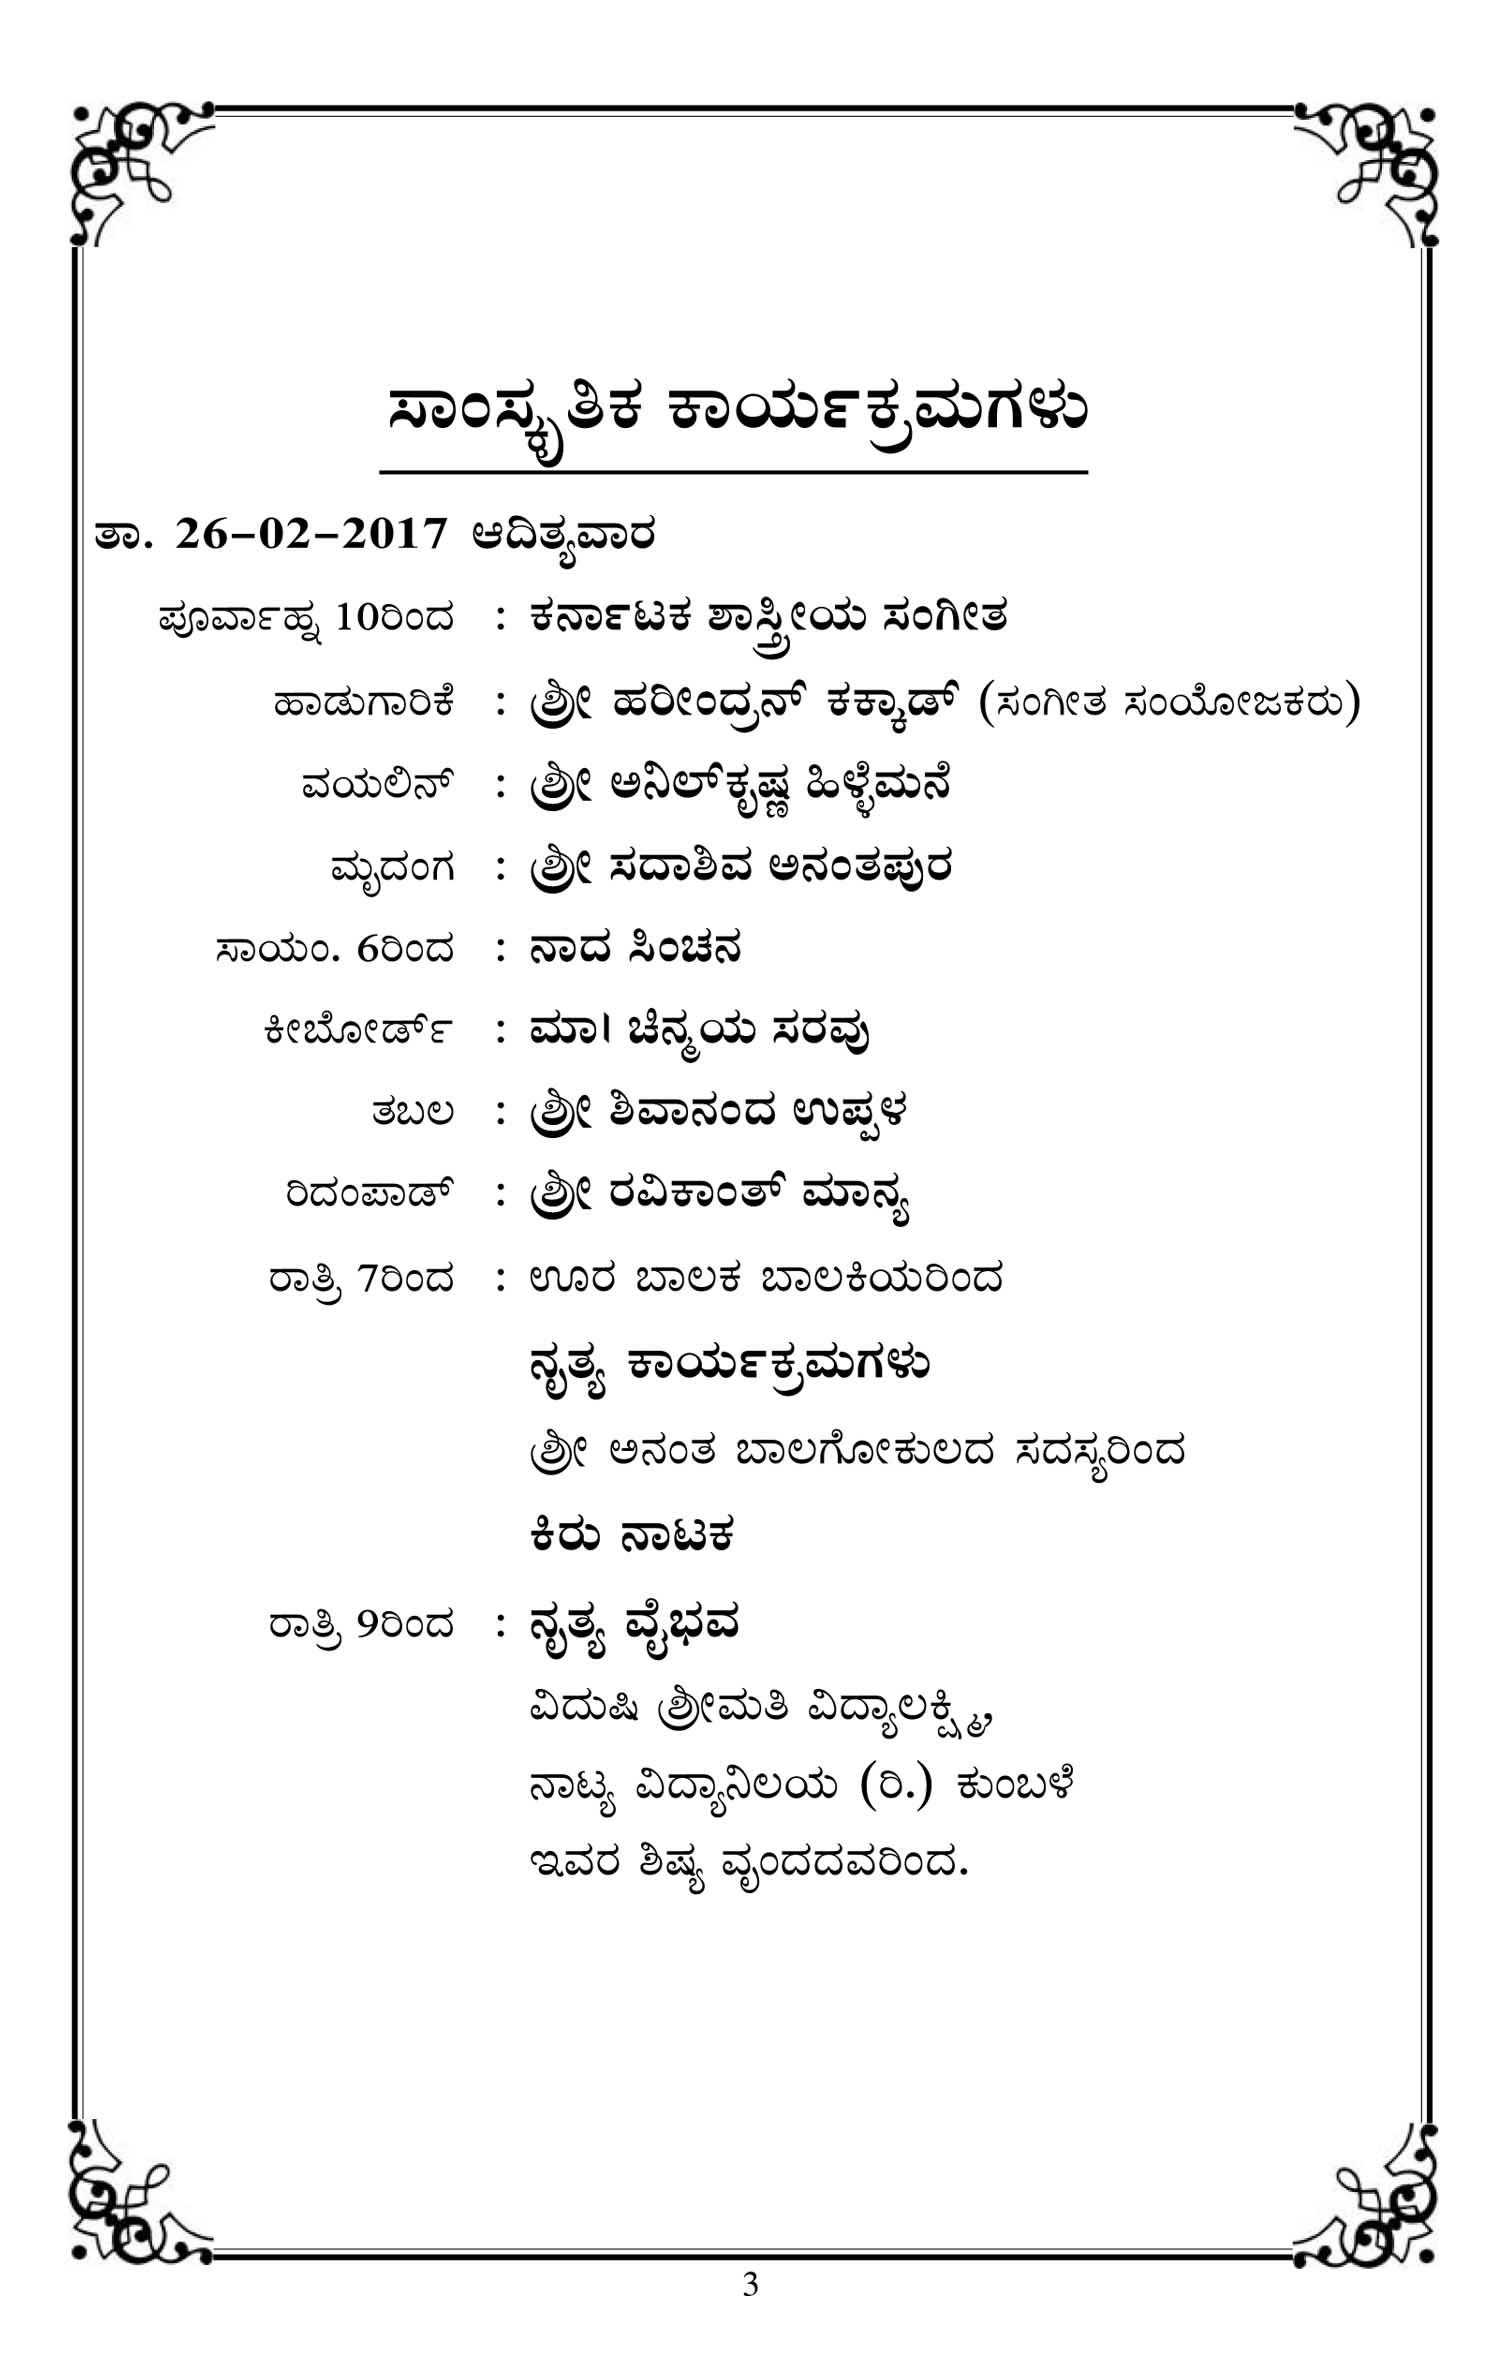 Prakrithi Yuva Thanda Cultural Programs 26-2-2017 3